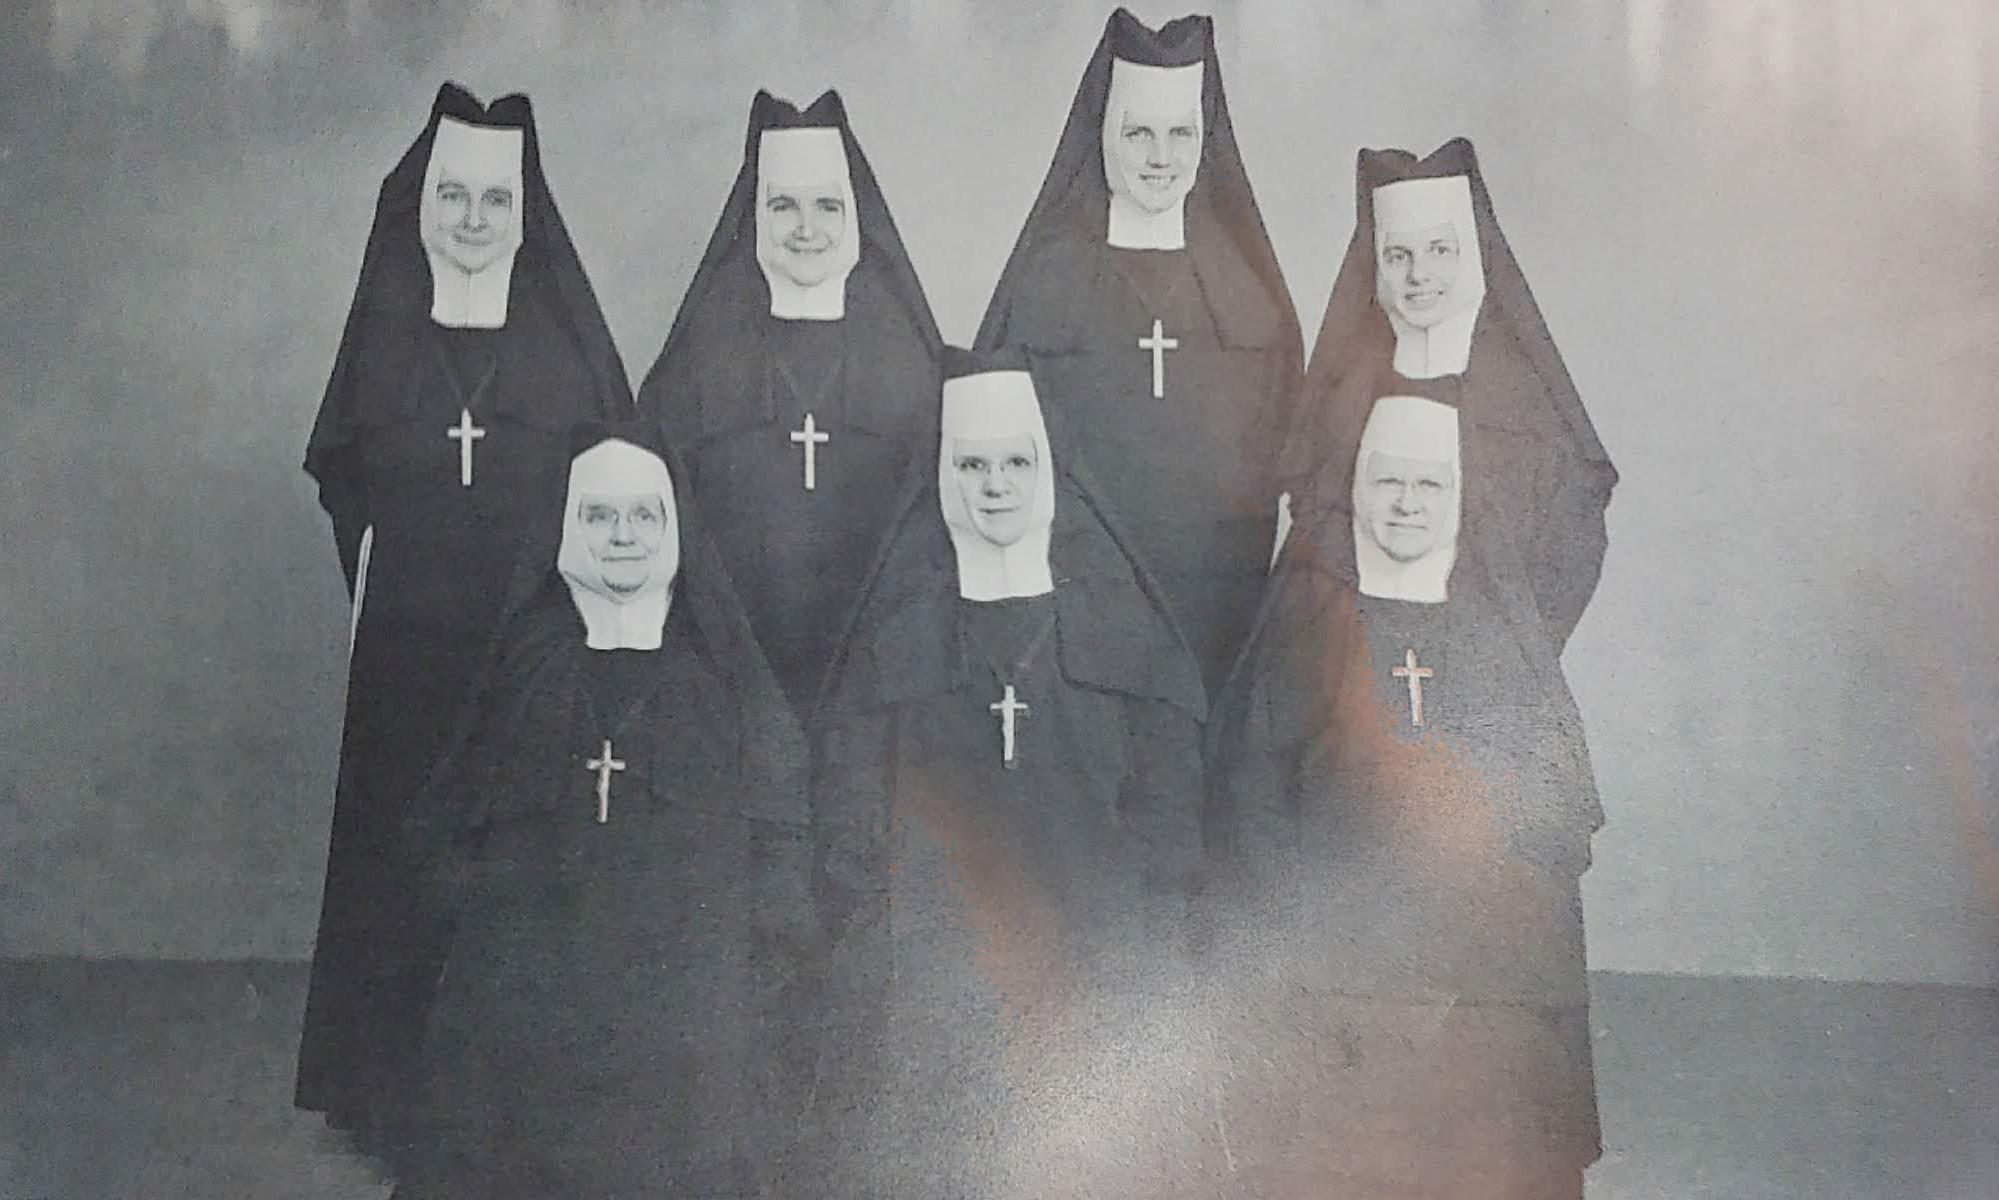 church-history-sisters.jpg